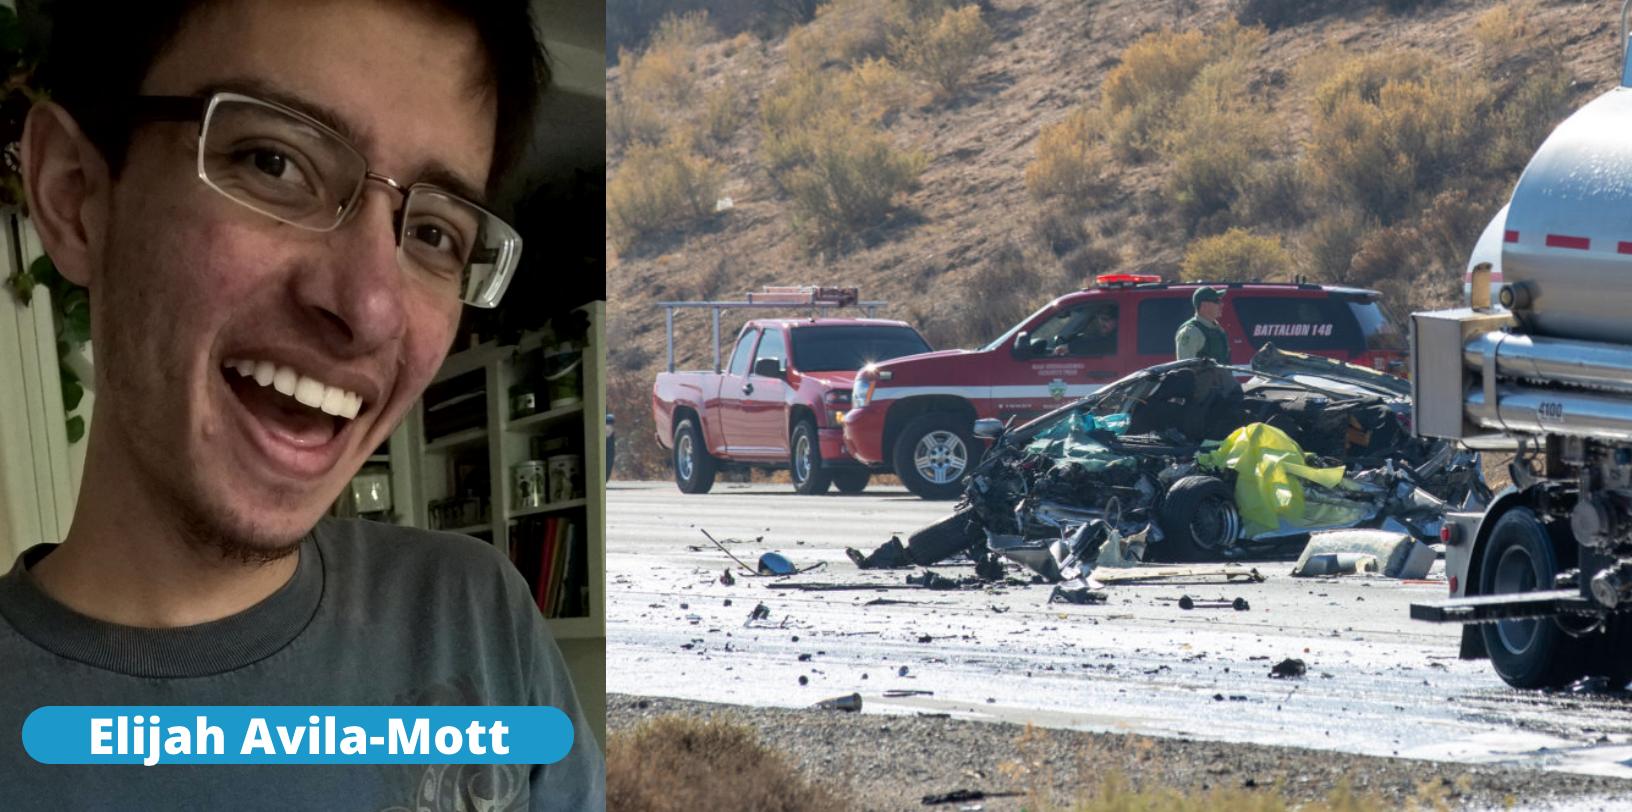 San Bernardino County Coroner Identified the man as 22 year-old Elijah Steven Avila-Mott of Diamond Bar.